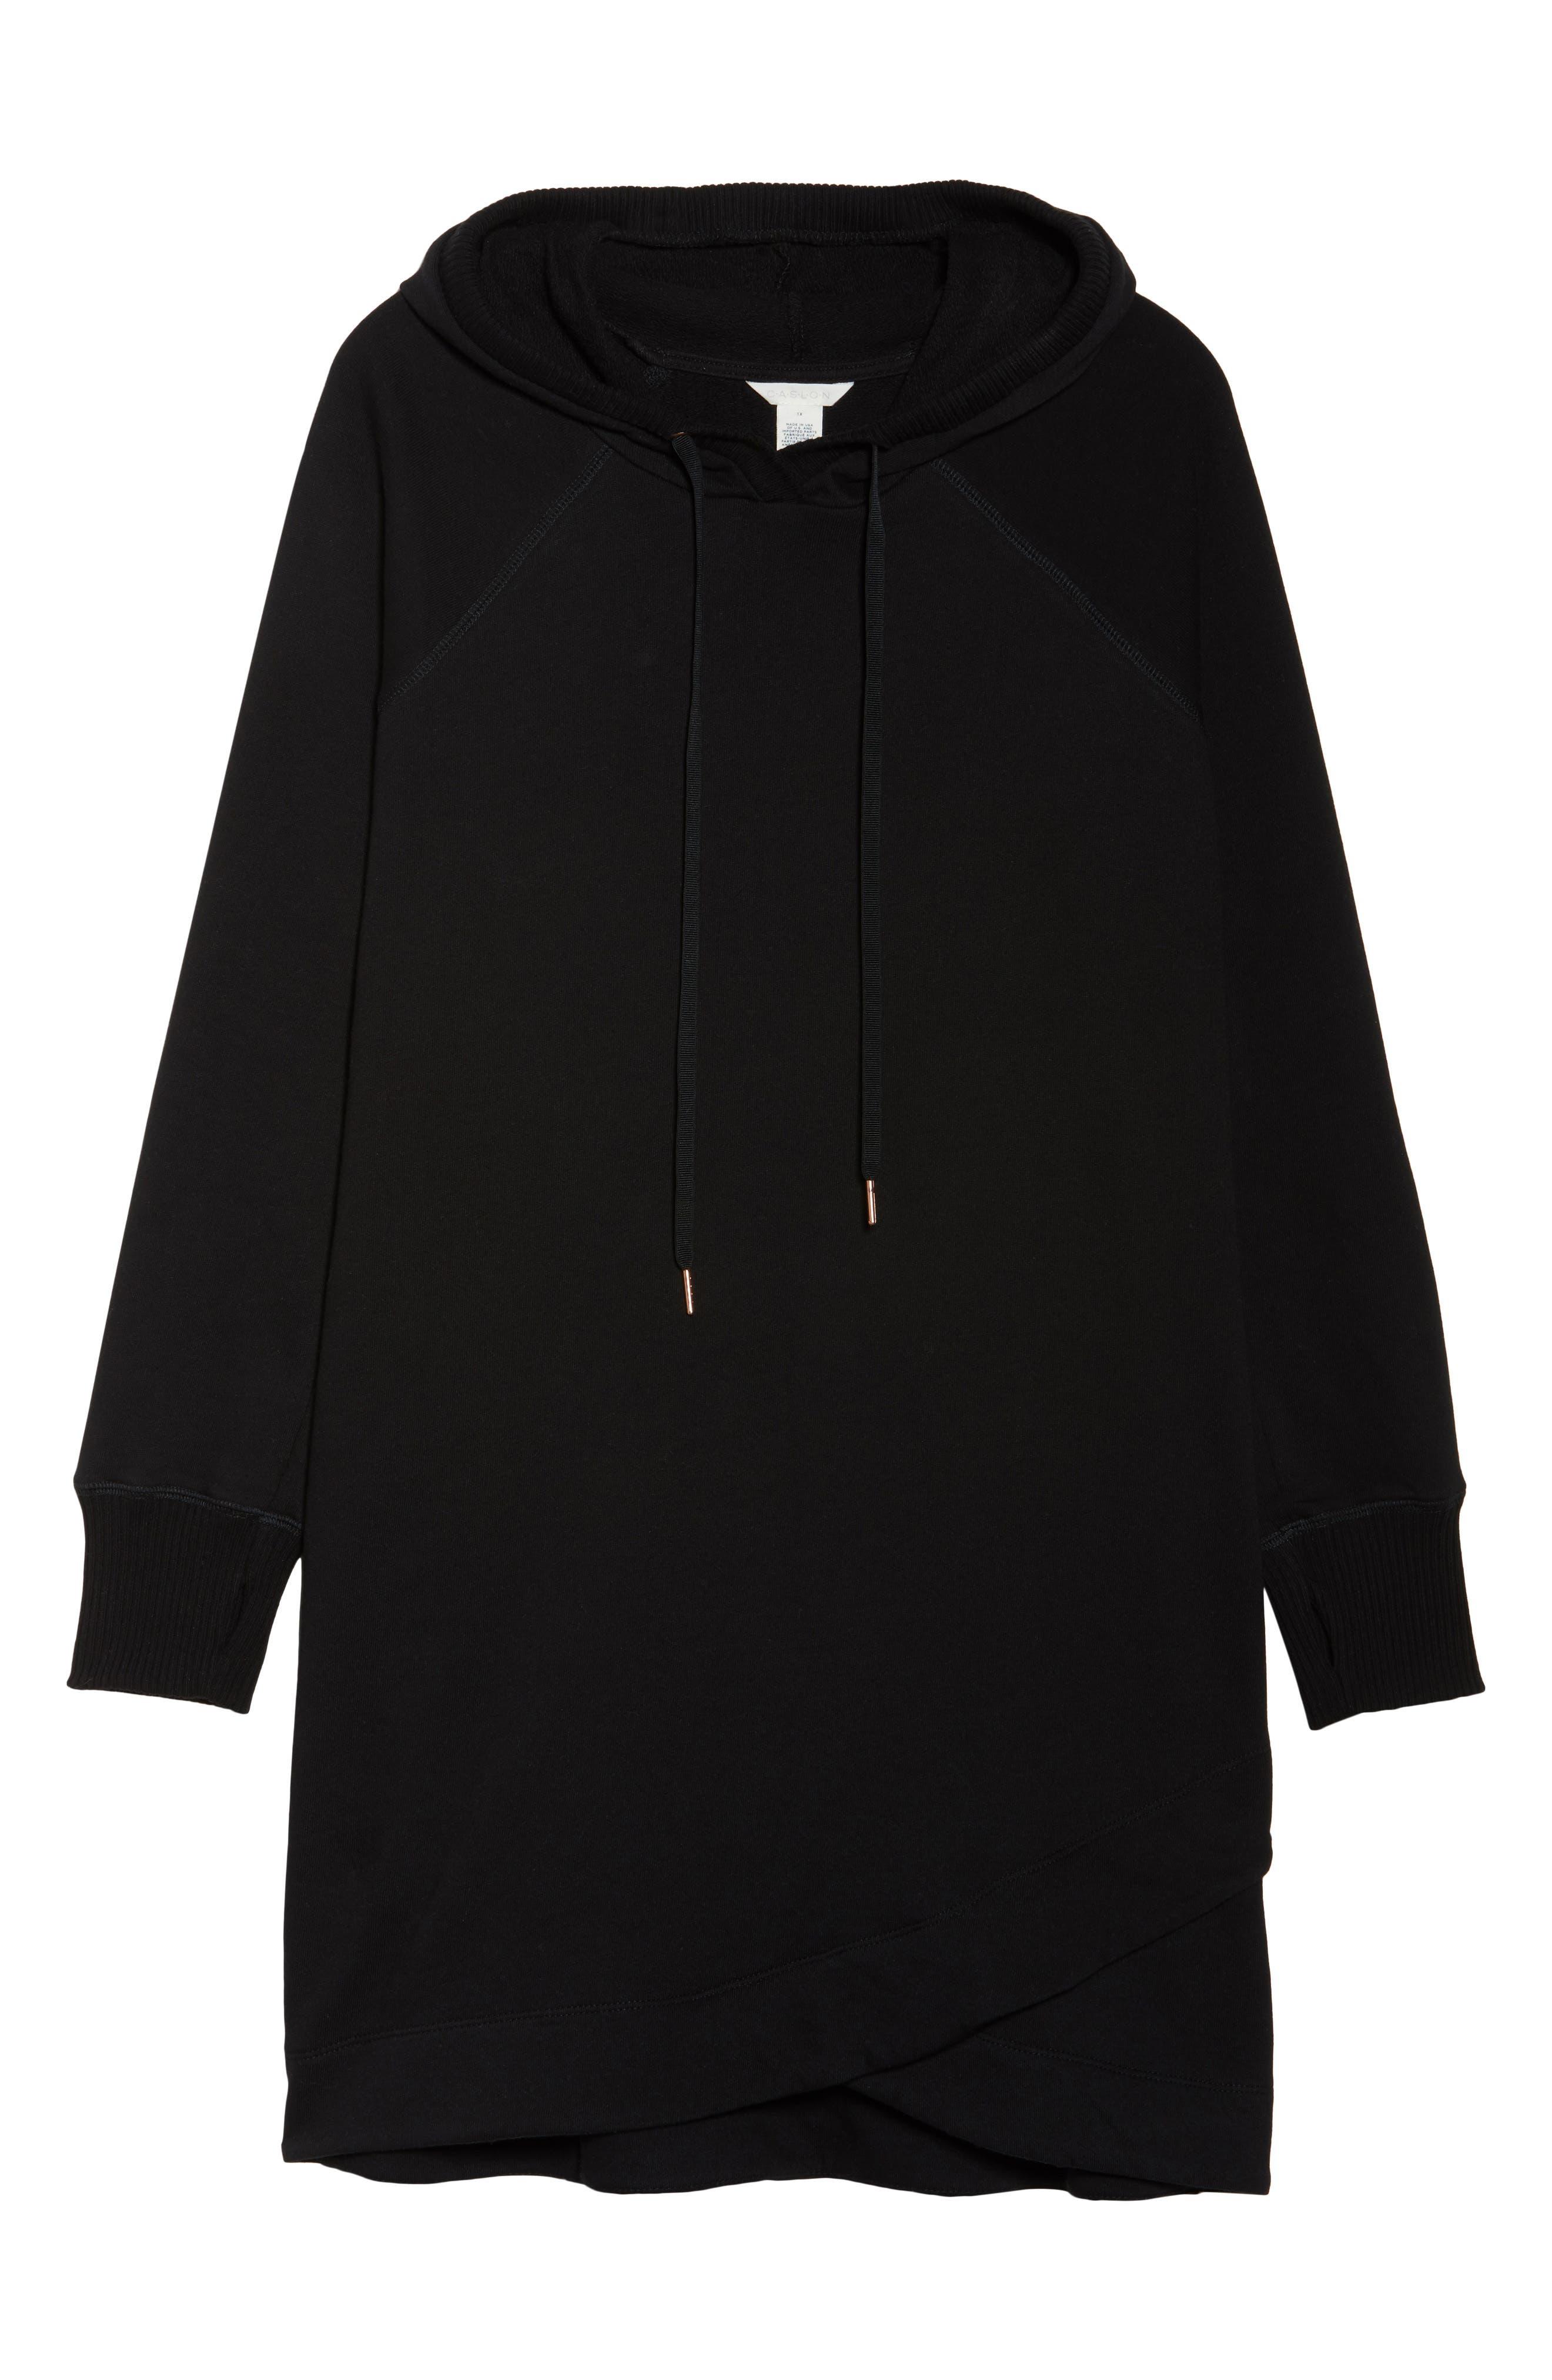 CASLON<SUP>®</SUP>,                             Off-Duty Hooded Sweatshirt Dress,                             Alternate thumbnail 6, color,                             001